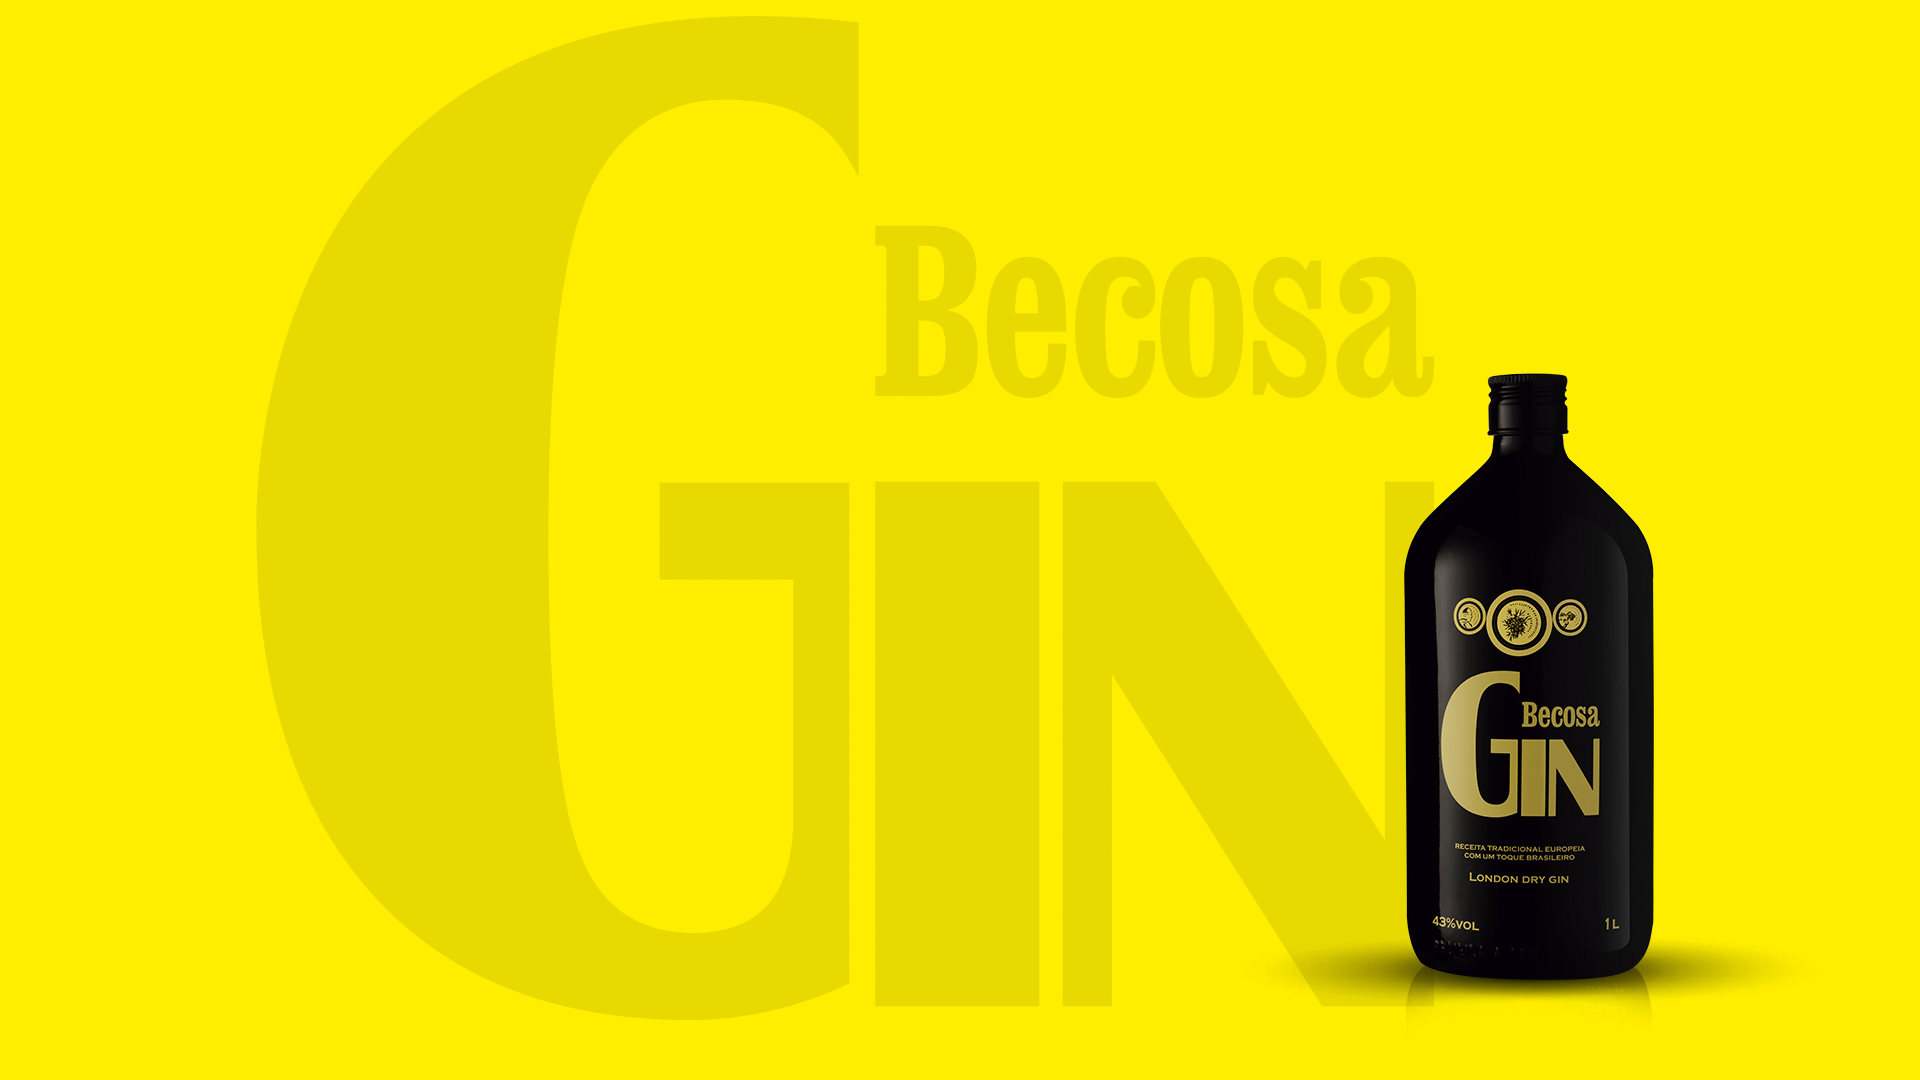 Novo Gin Becosa